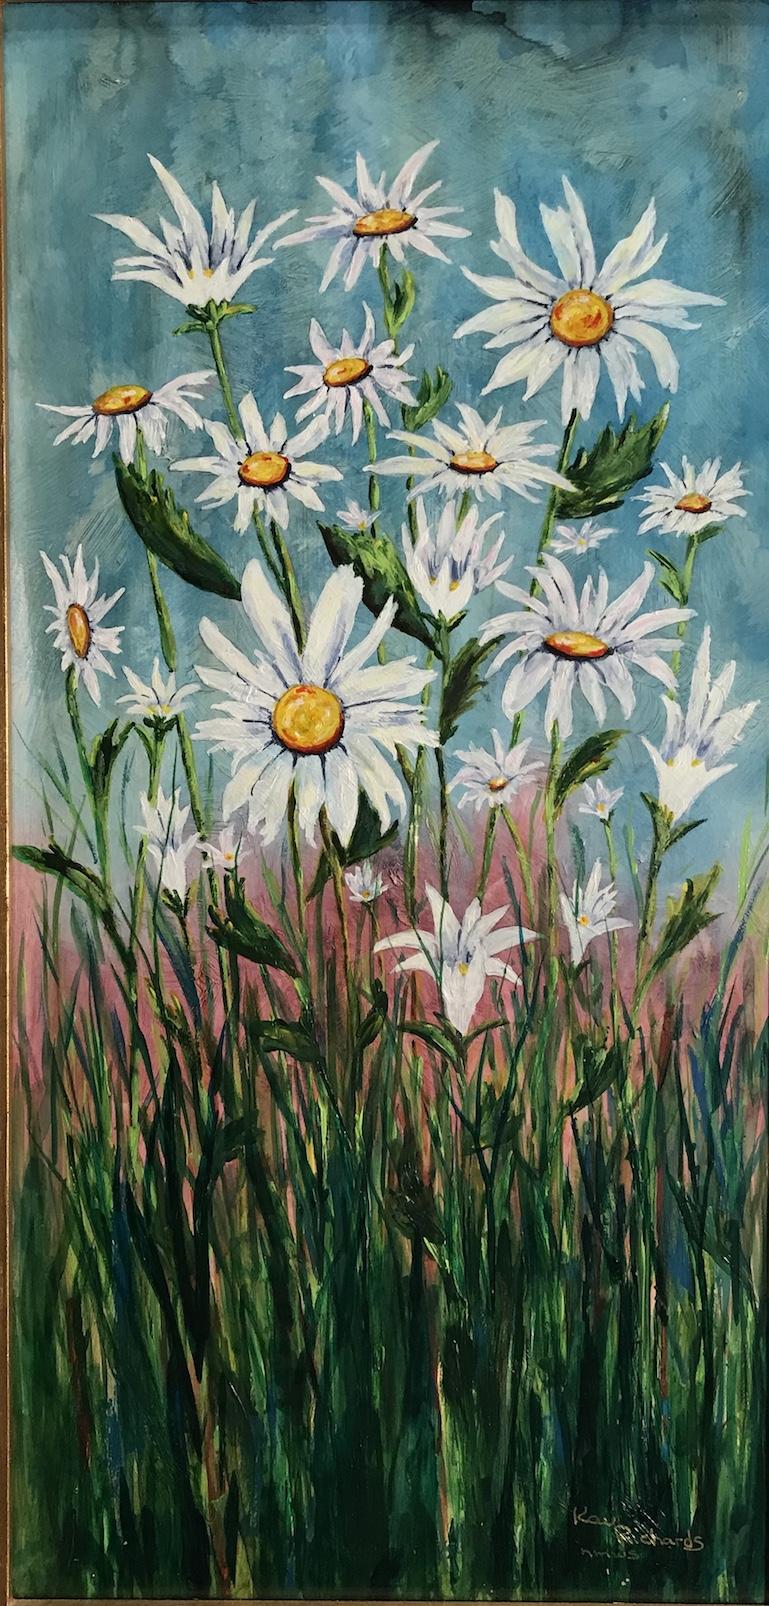 Kay Richards: Daisies